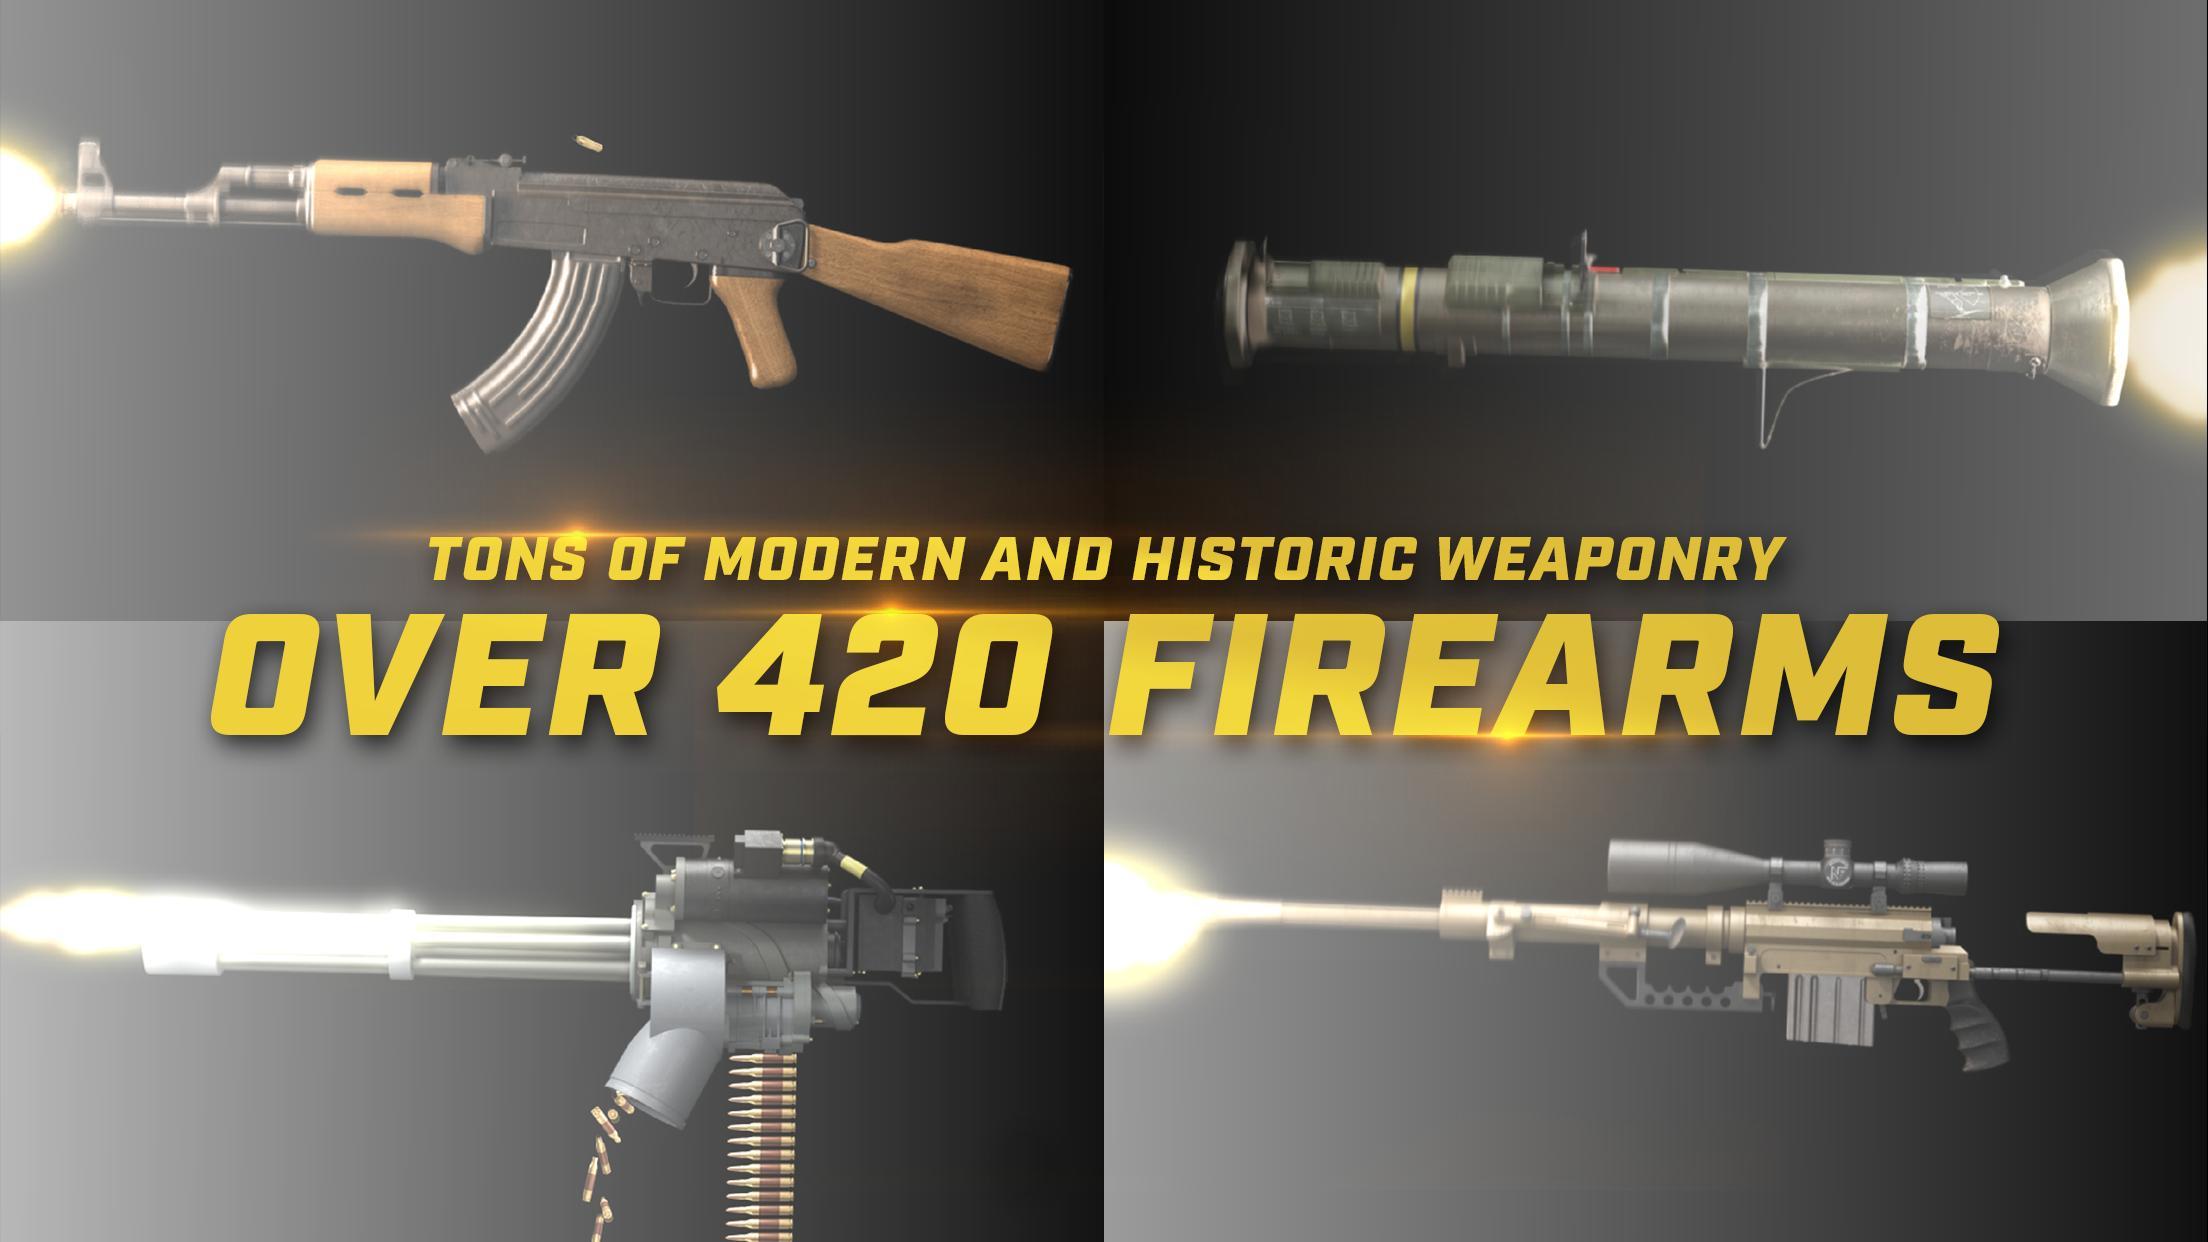 iGun Pro The Original Gun App 5.26 Screenshot 2